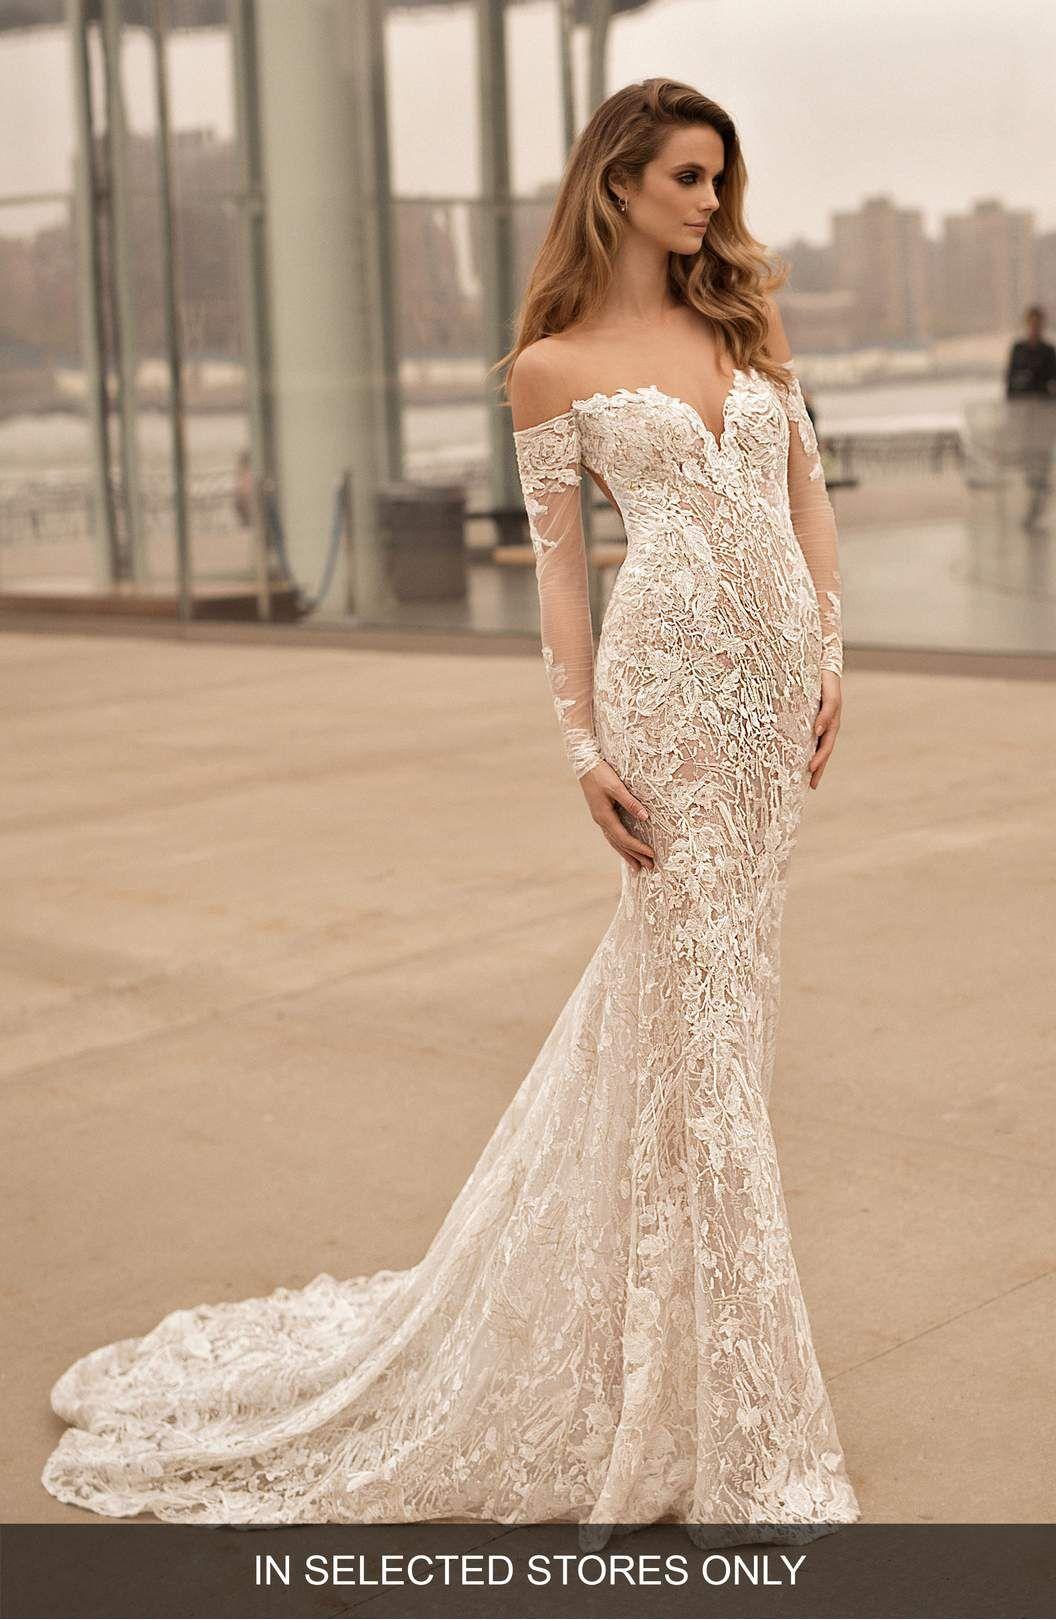 Tea length sleeve wedding dress  Main Image  Berta Long Sleeve Illusion Off the Shoulder Mermaid